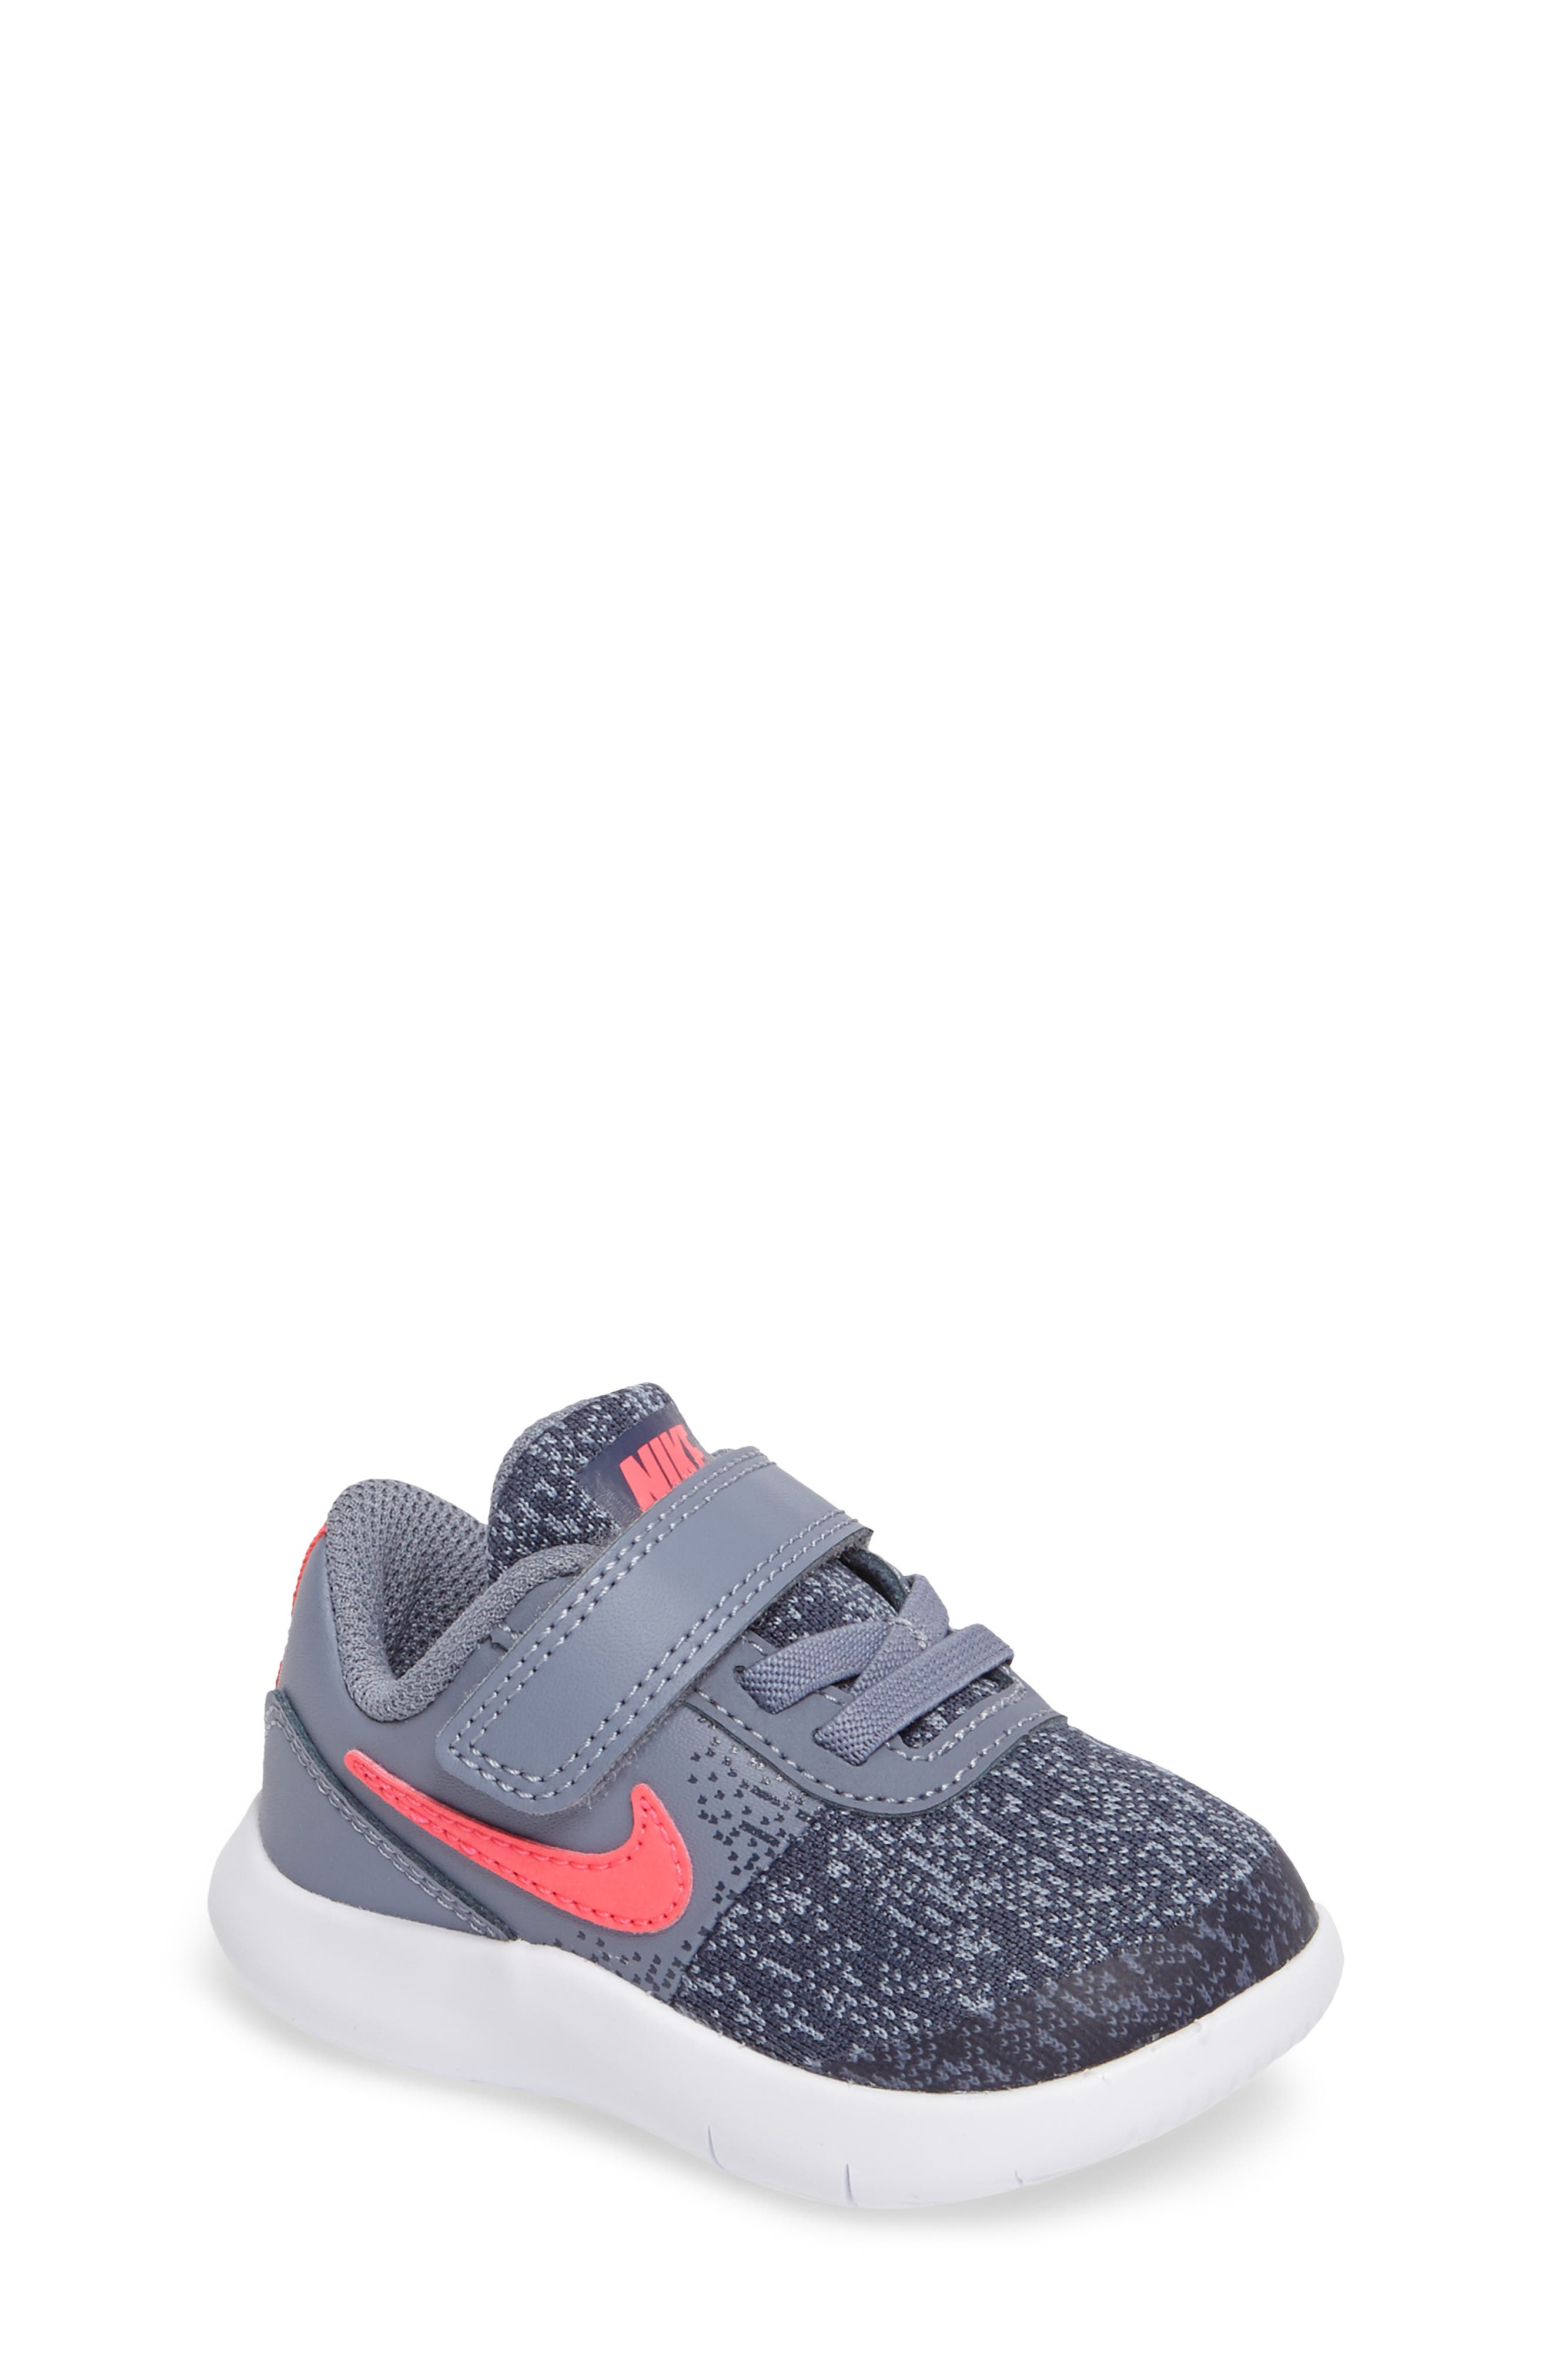 Flex Contact Sneaker,                             Main thumbnail 1, color,                             Racer Pink/ Thunder Blue